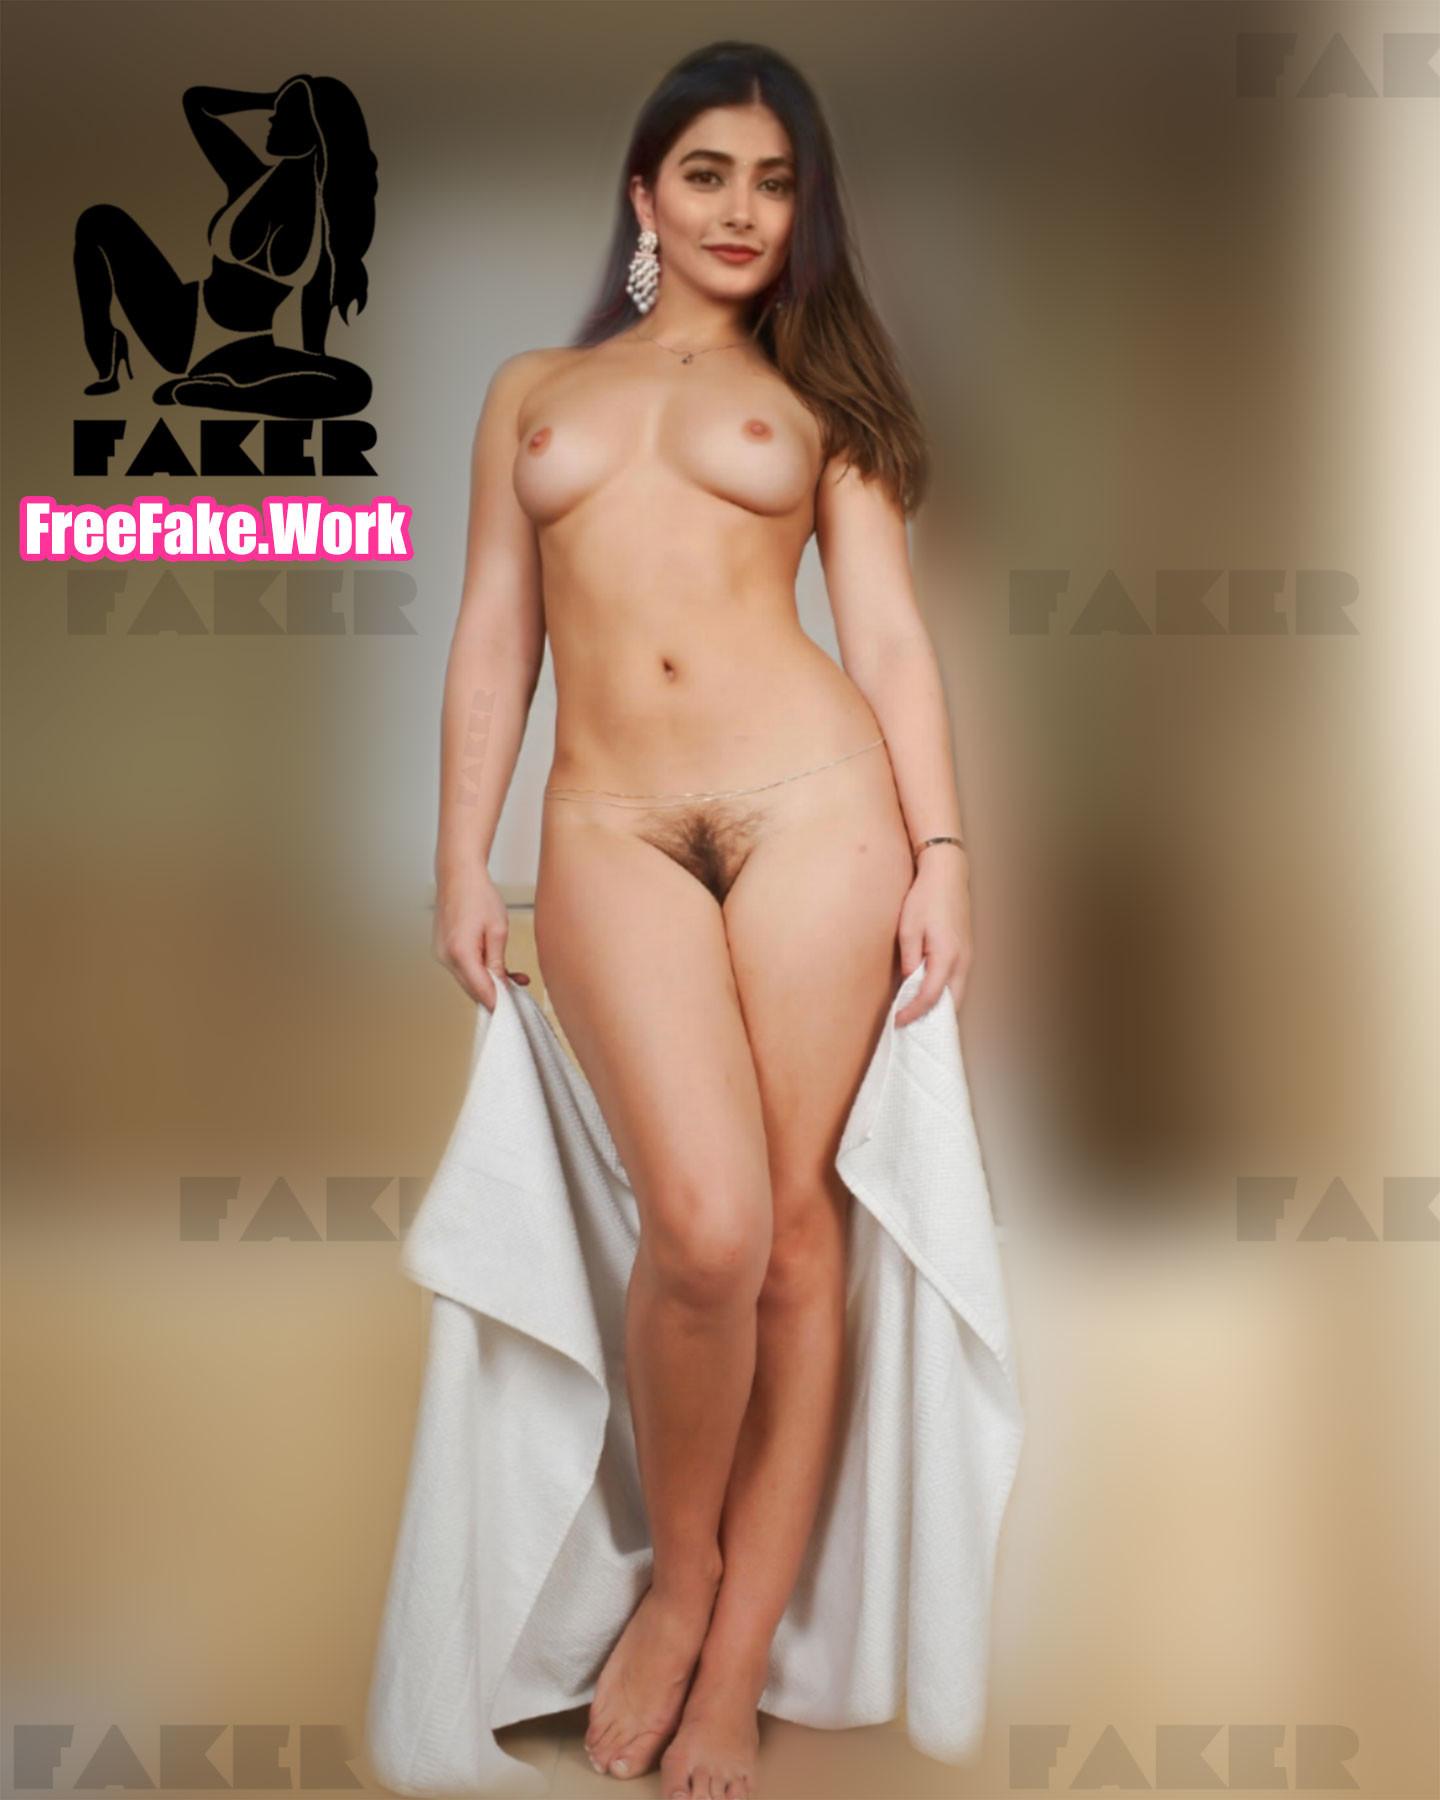 Pooja-Hegde-sexy-naked-slim-body-hairy-pussy-xnxx.jpg